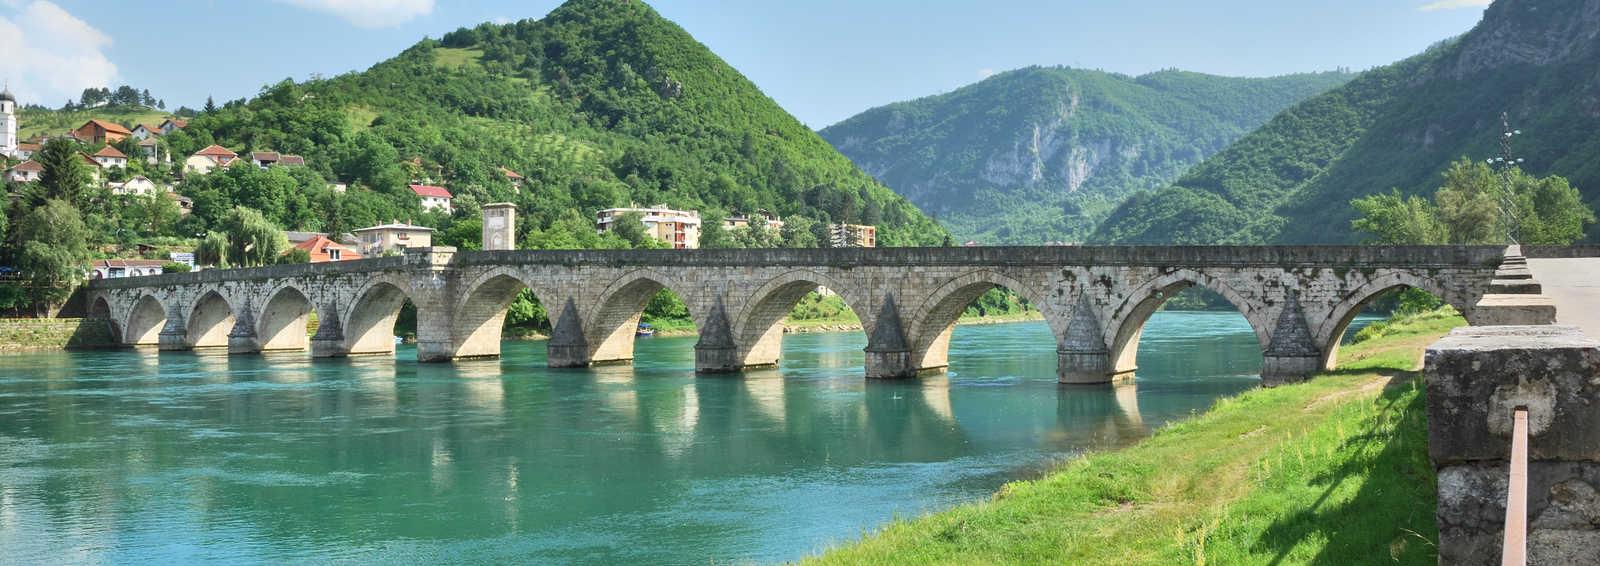 Mehmed Paša Sokolović Bridge, Bosnia and Hezegovina